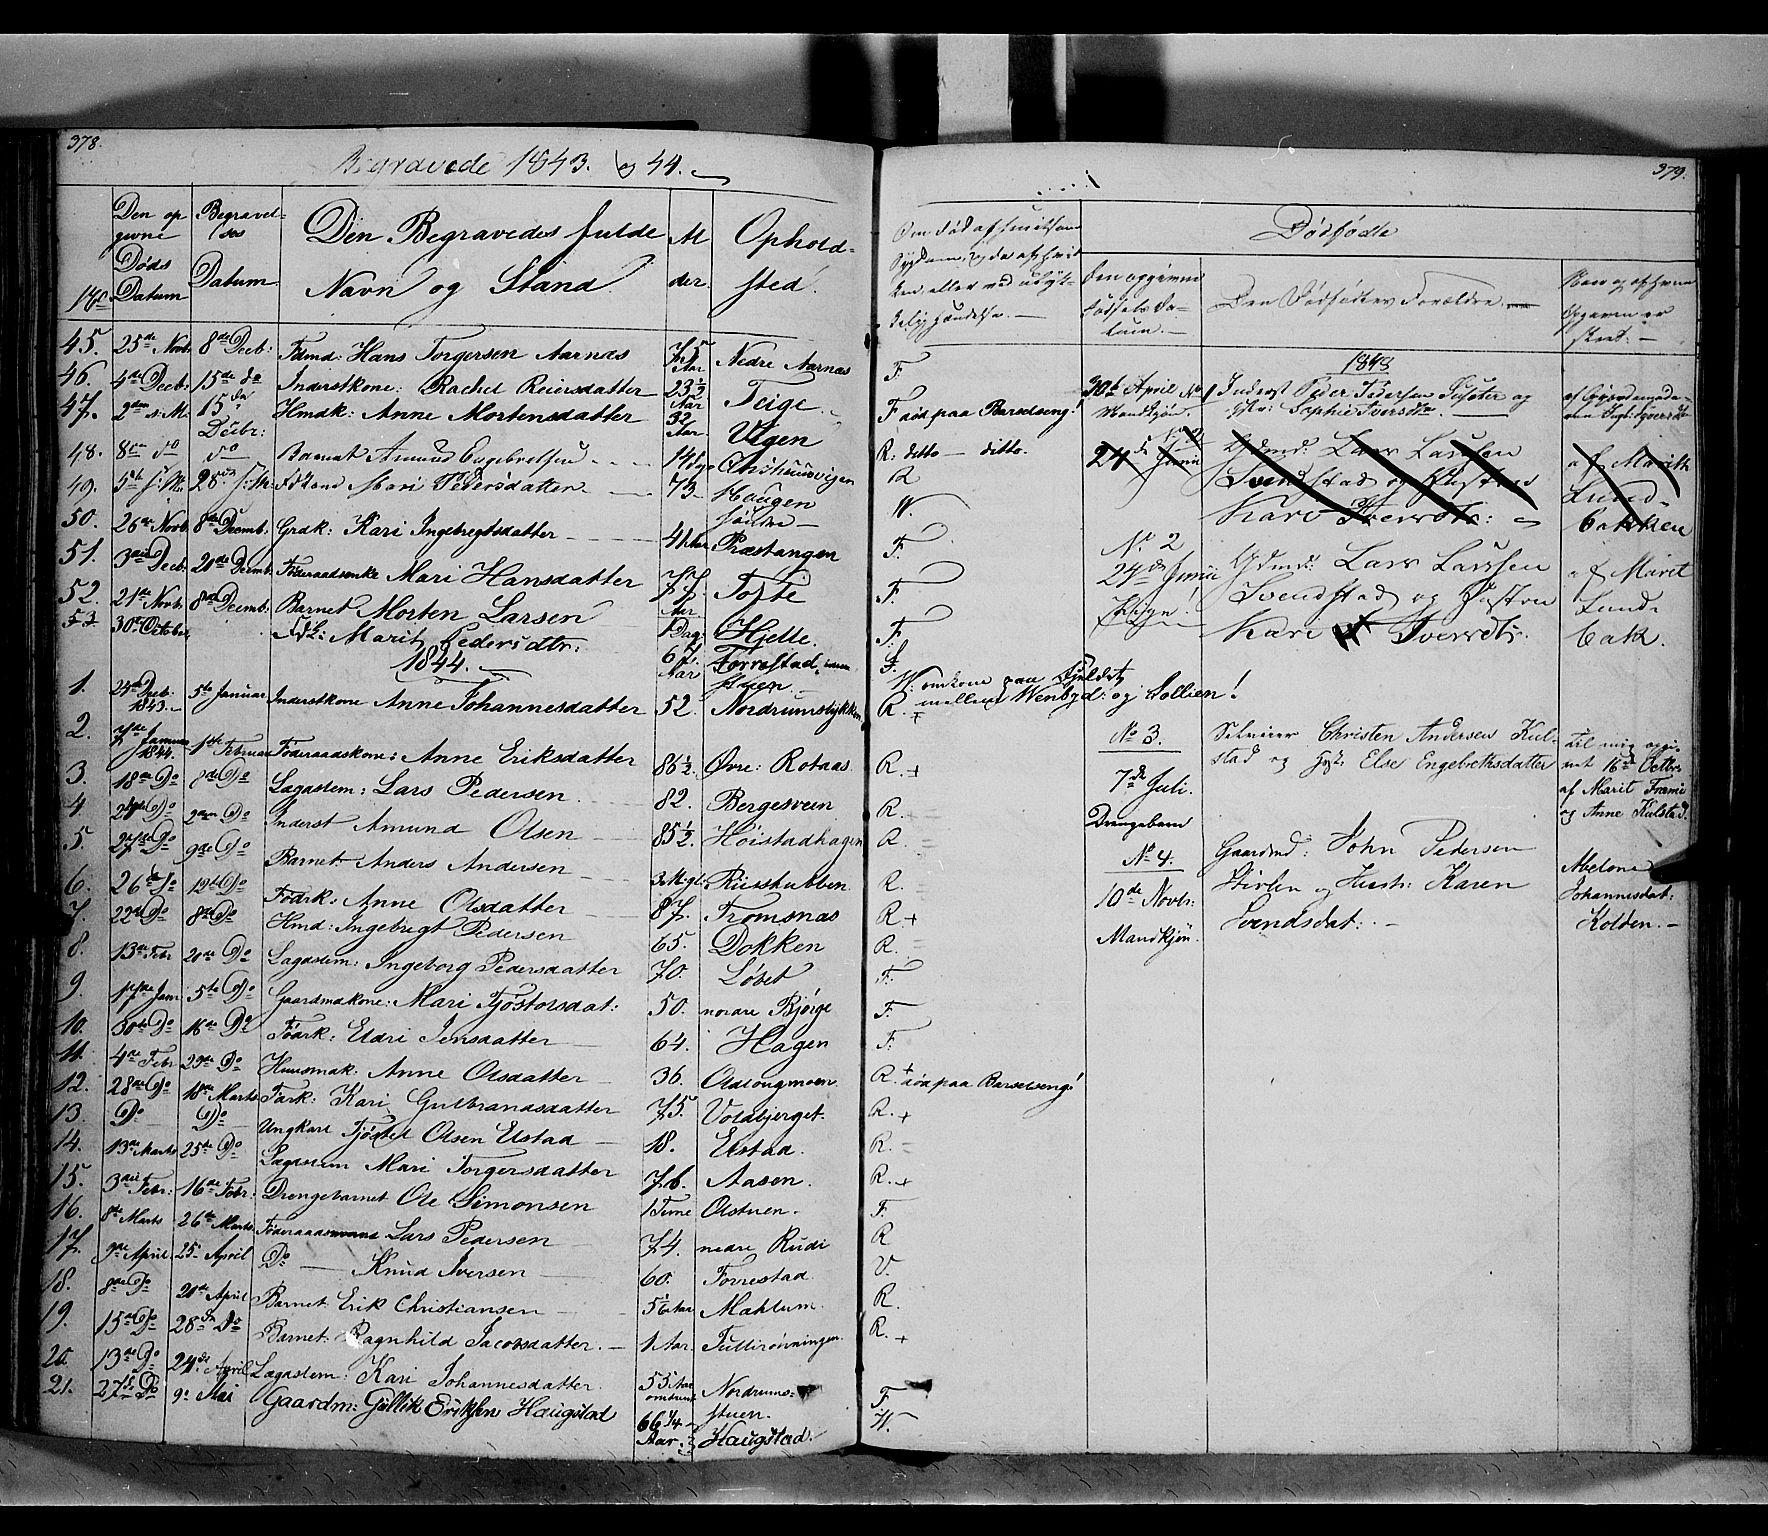 SAH, Ringebu prestekontor, Ministerialbok nr. 5, 1839-1848, s. 378-379